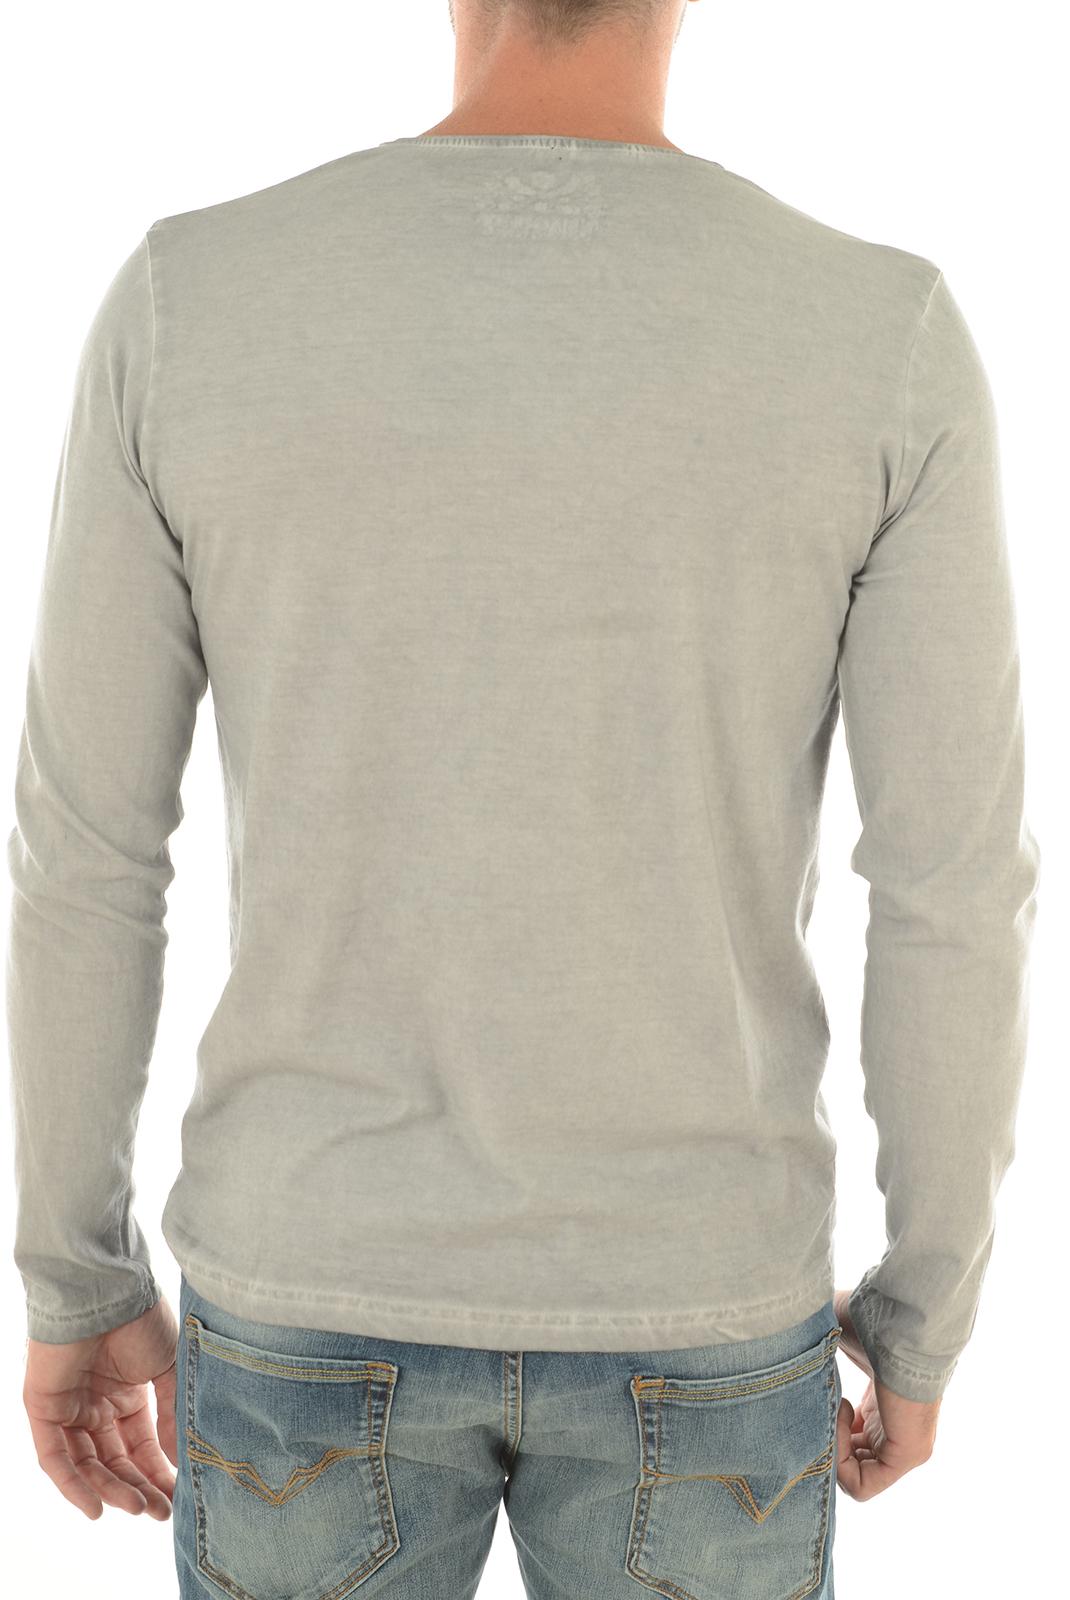 Tee-shirts  Biaggio jeans LUMIL GRIS CLAIR